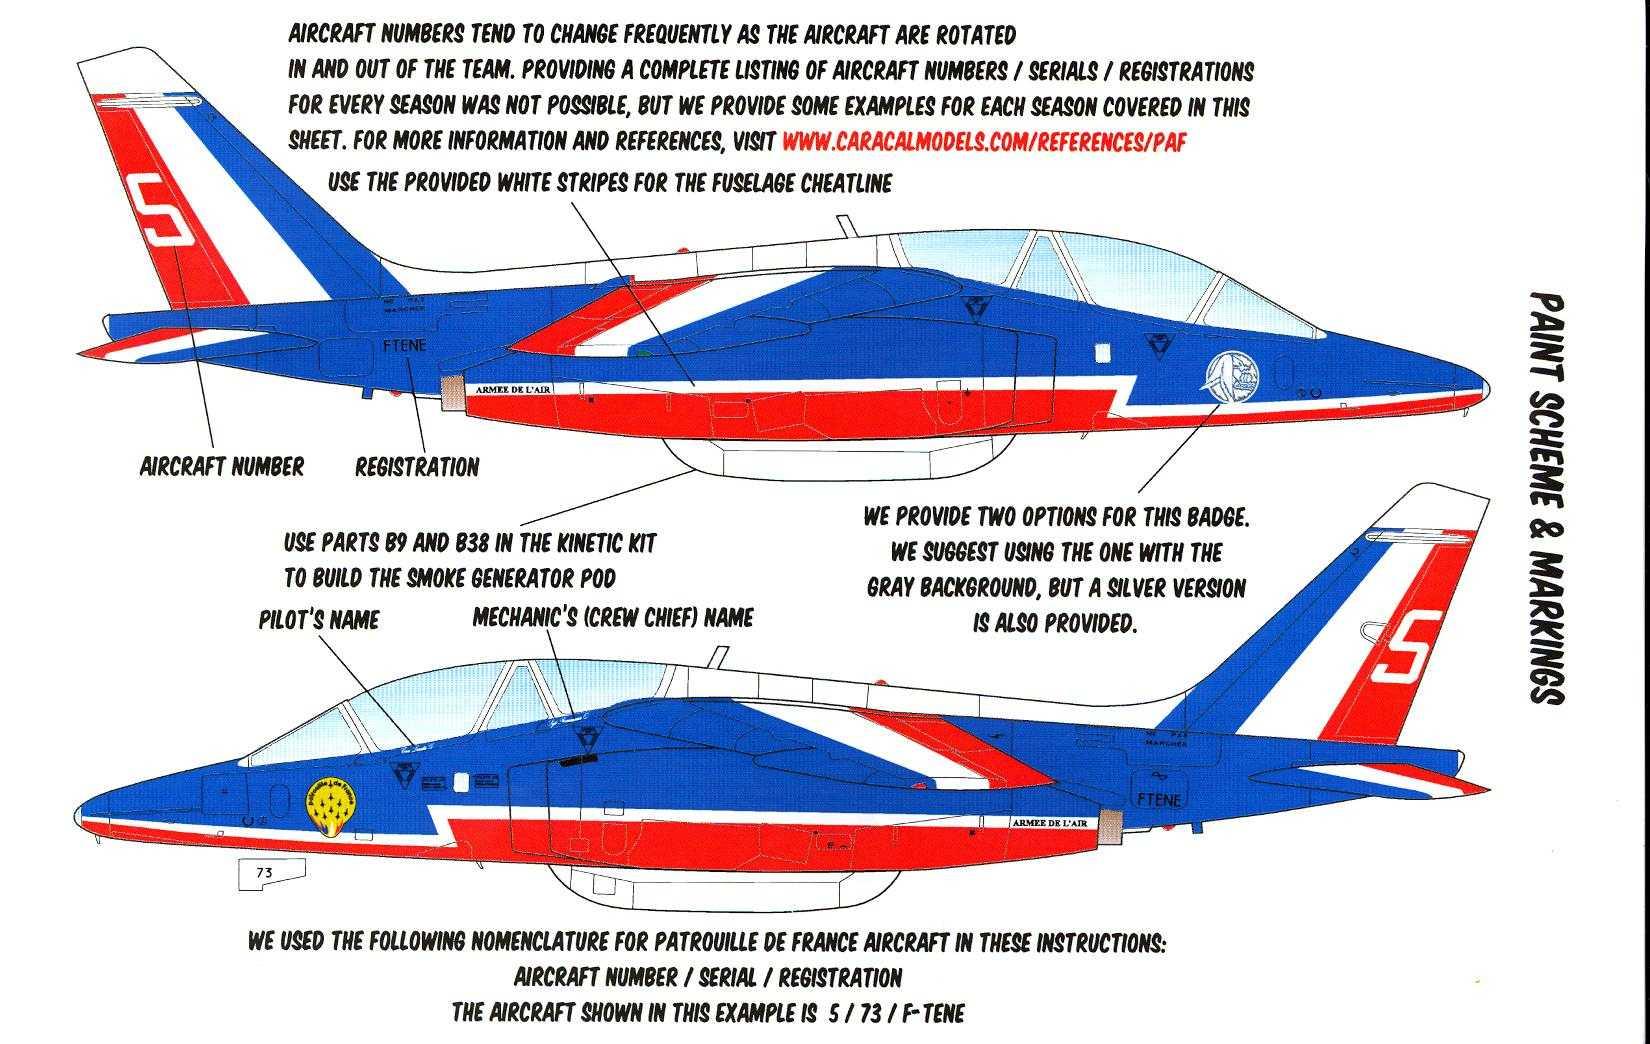 CARACAL DECALS 1/48 PATROUILLE de FRANCE French Alpha Jet Aerobatic Team